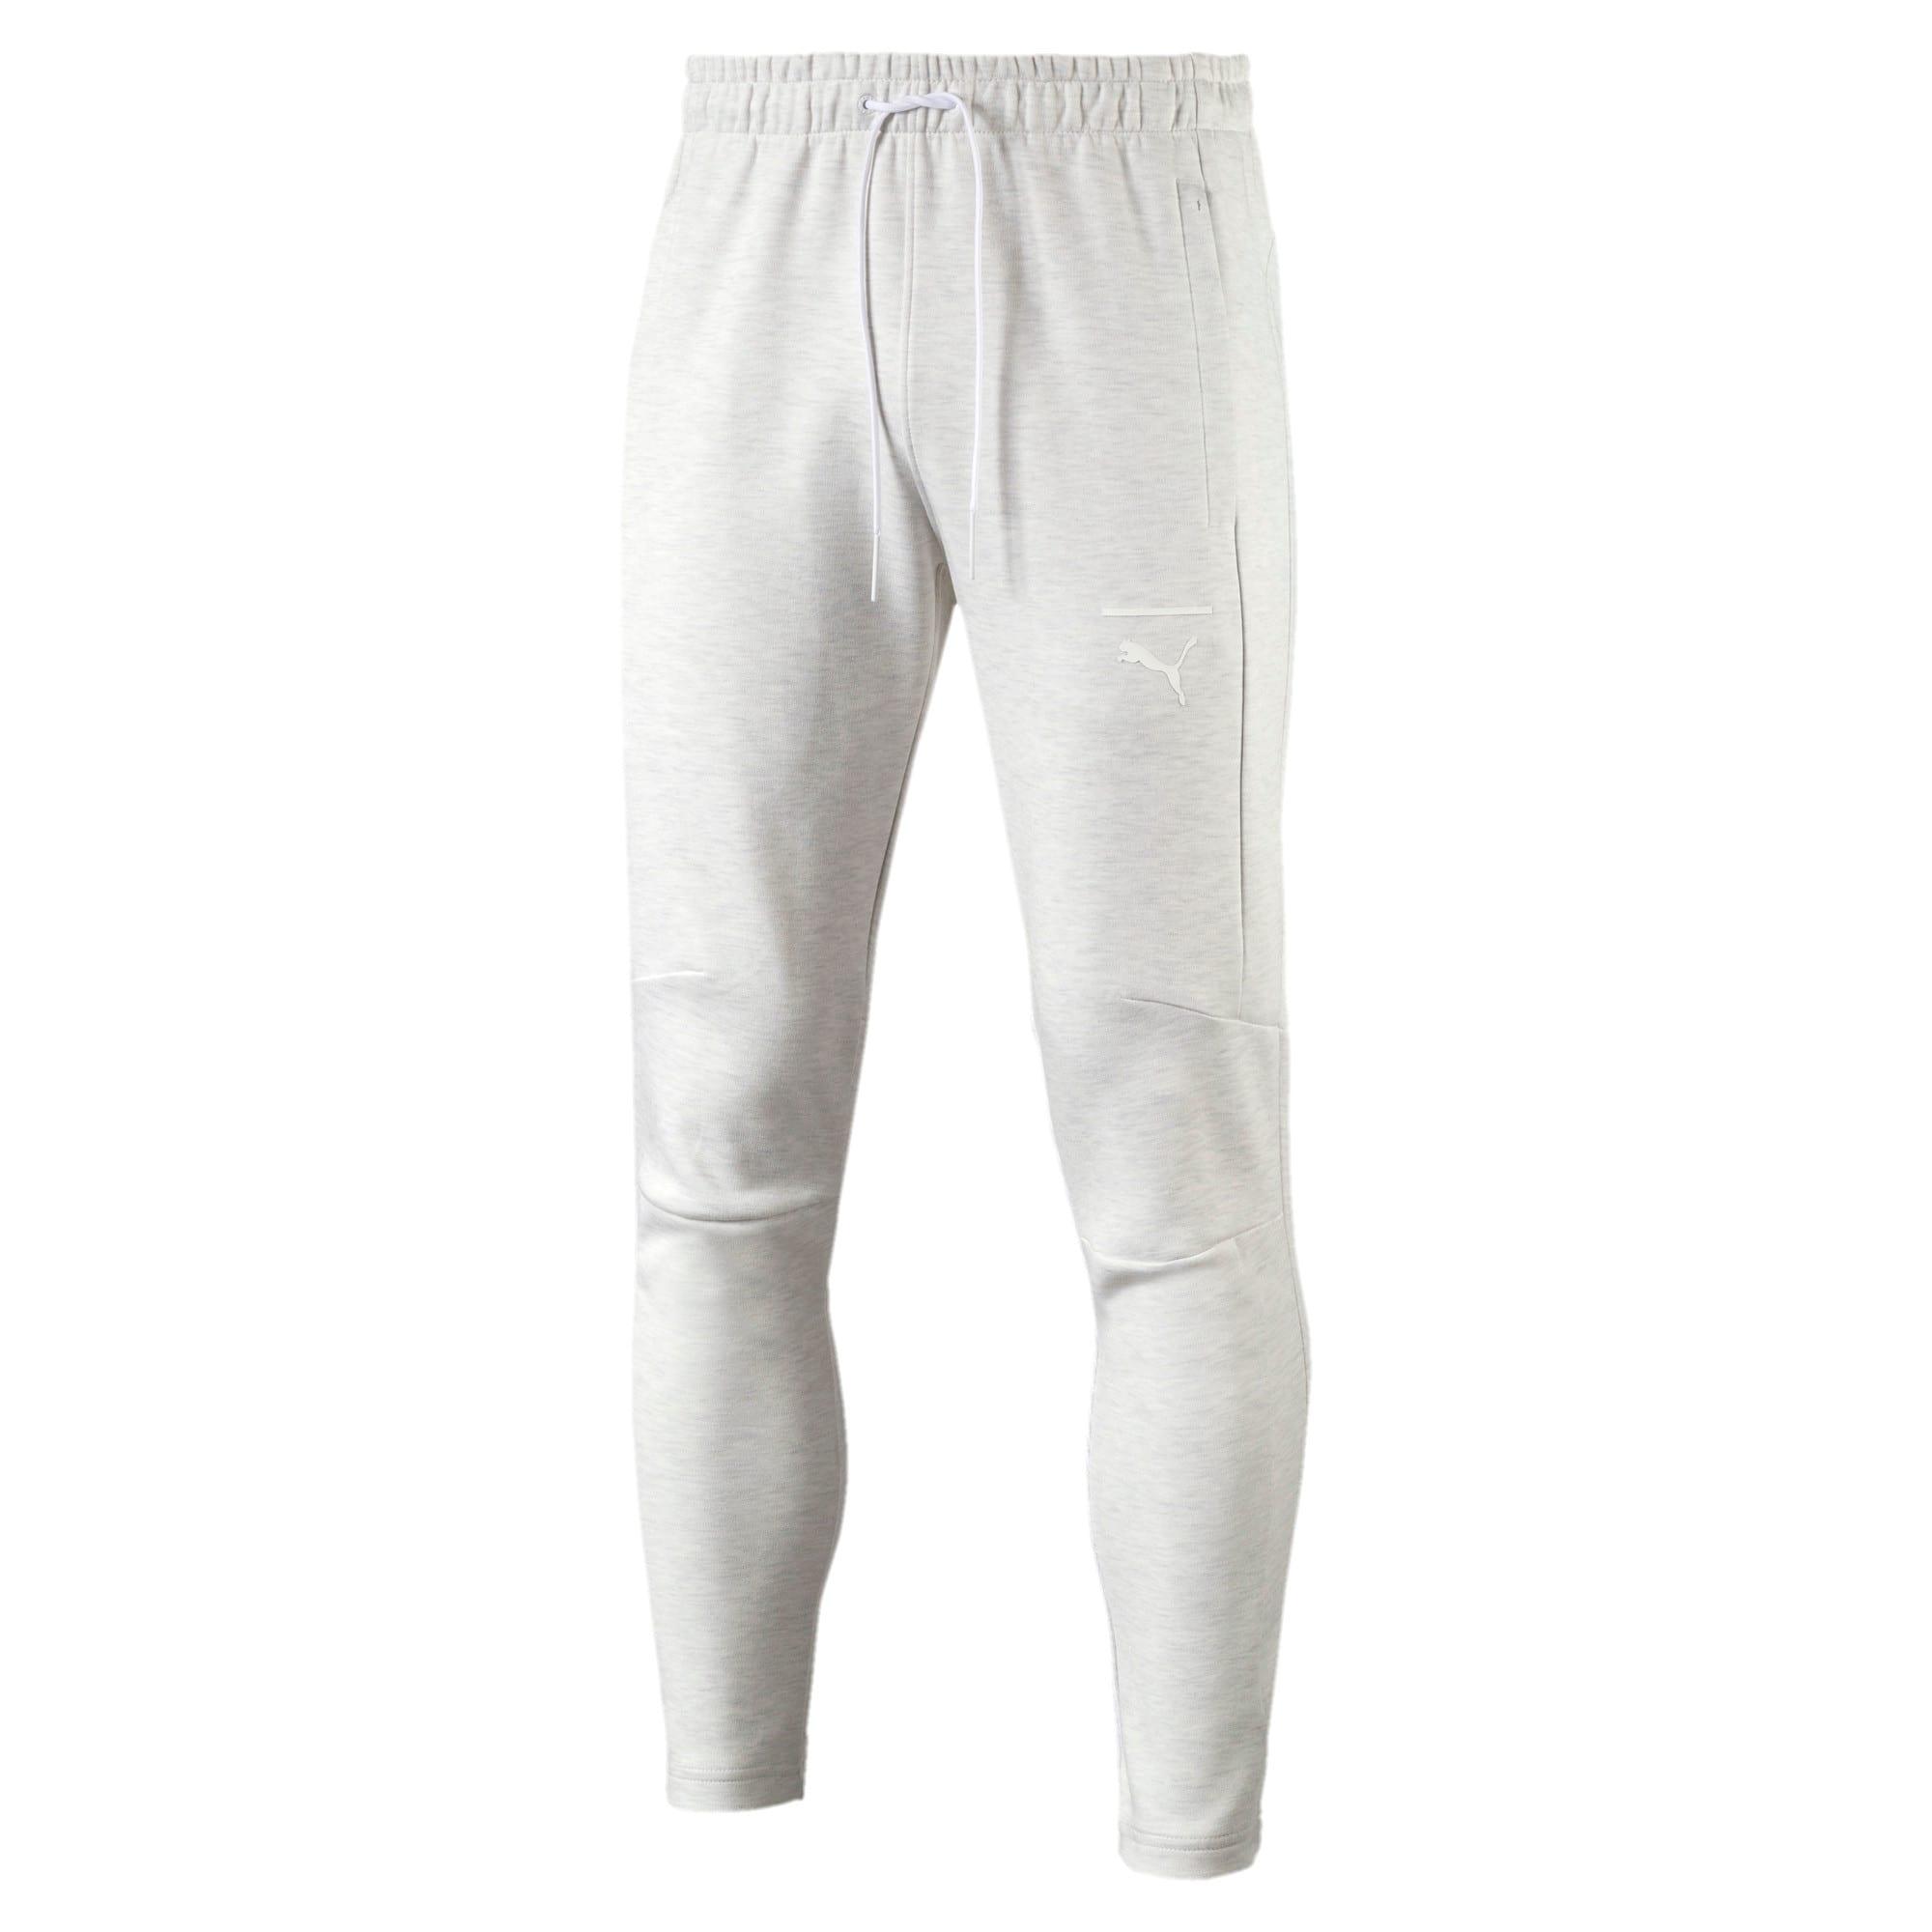 Thumbnail 1 of Pace Primary Men's Sweatpants, Puma White-Ice heather, medium-IND